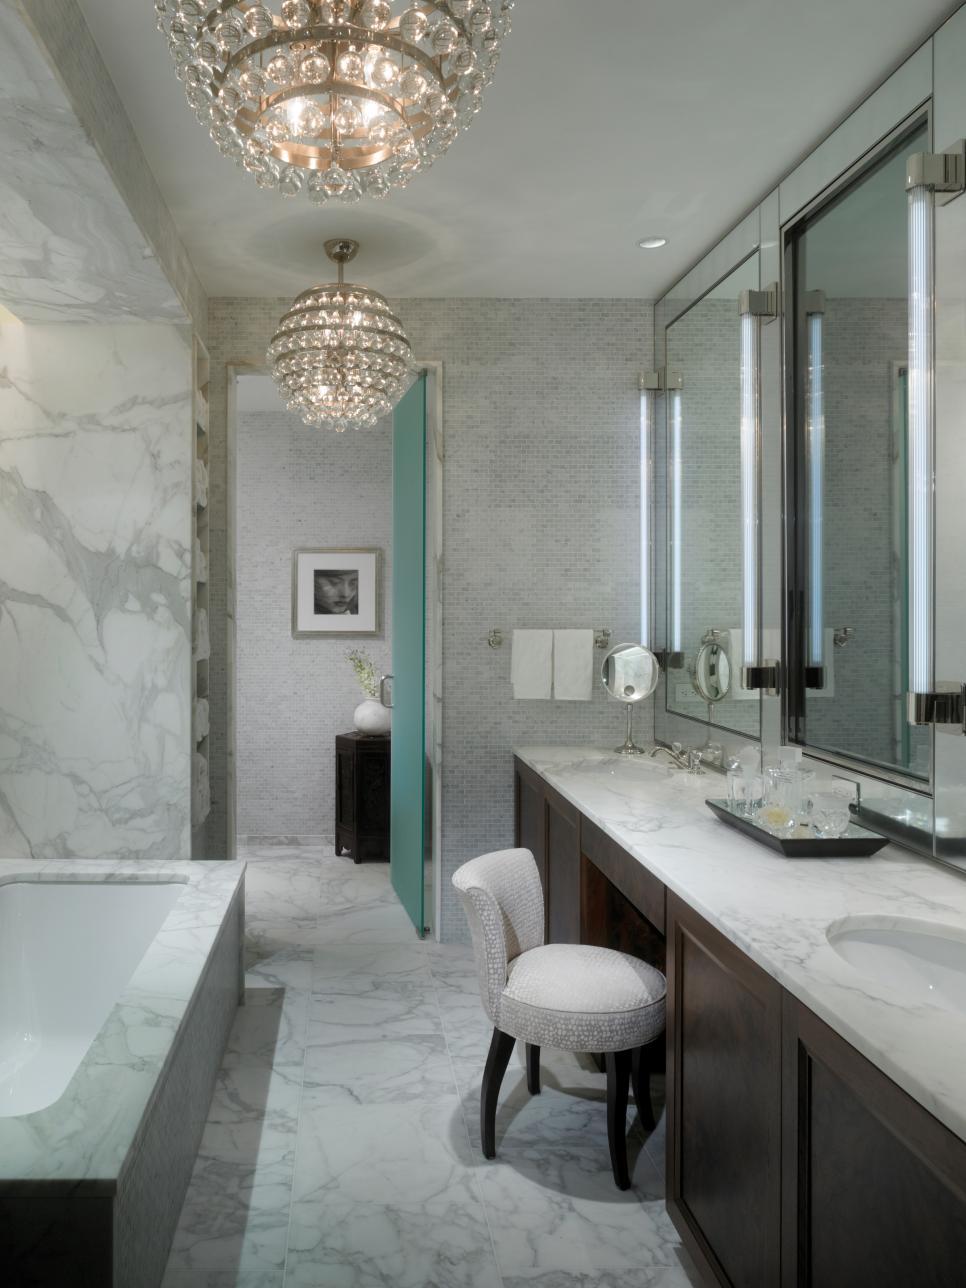 explore 10 beautiful bathshgtv